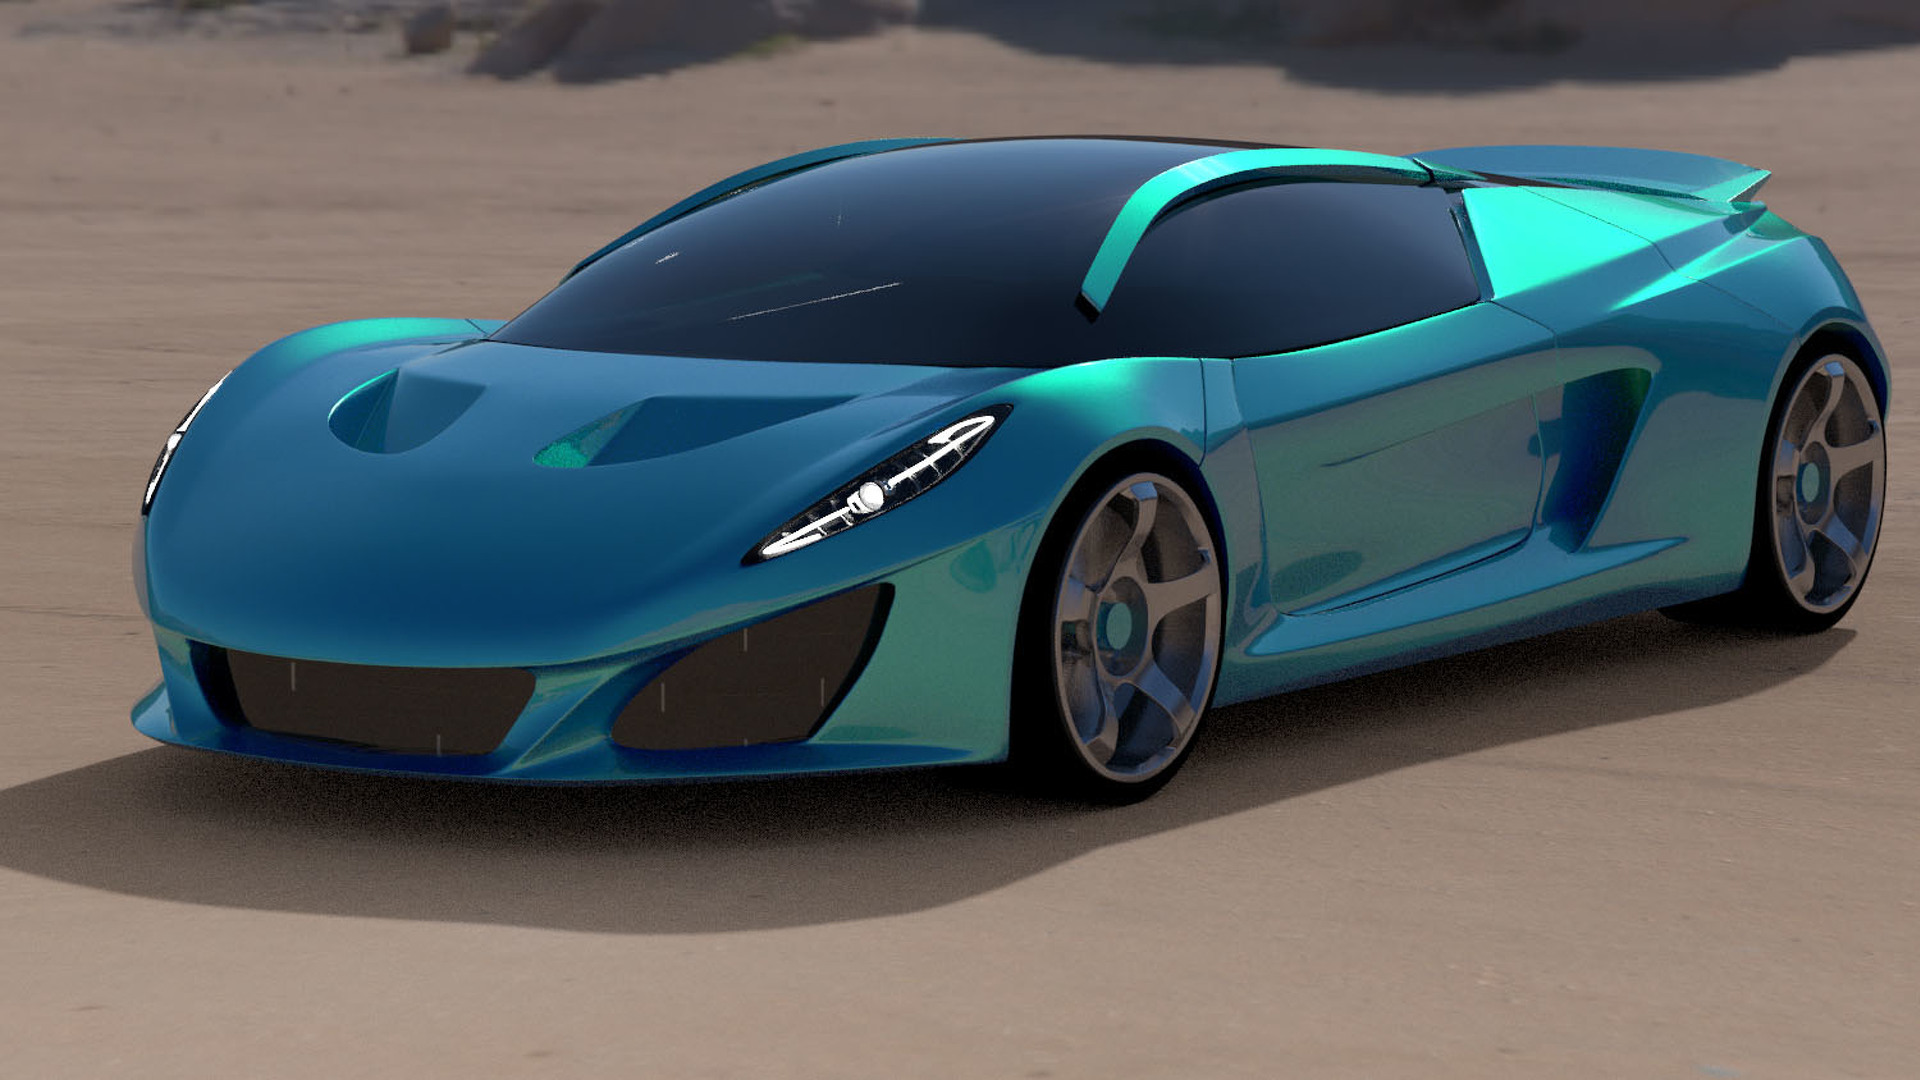 Keating Supercars Teases The Berus Ahead Of Debut